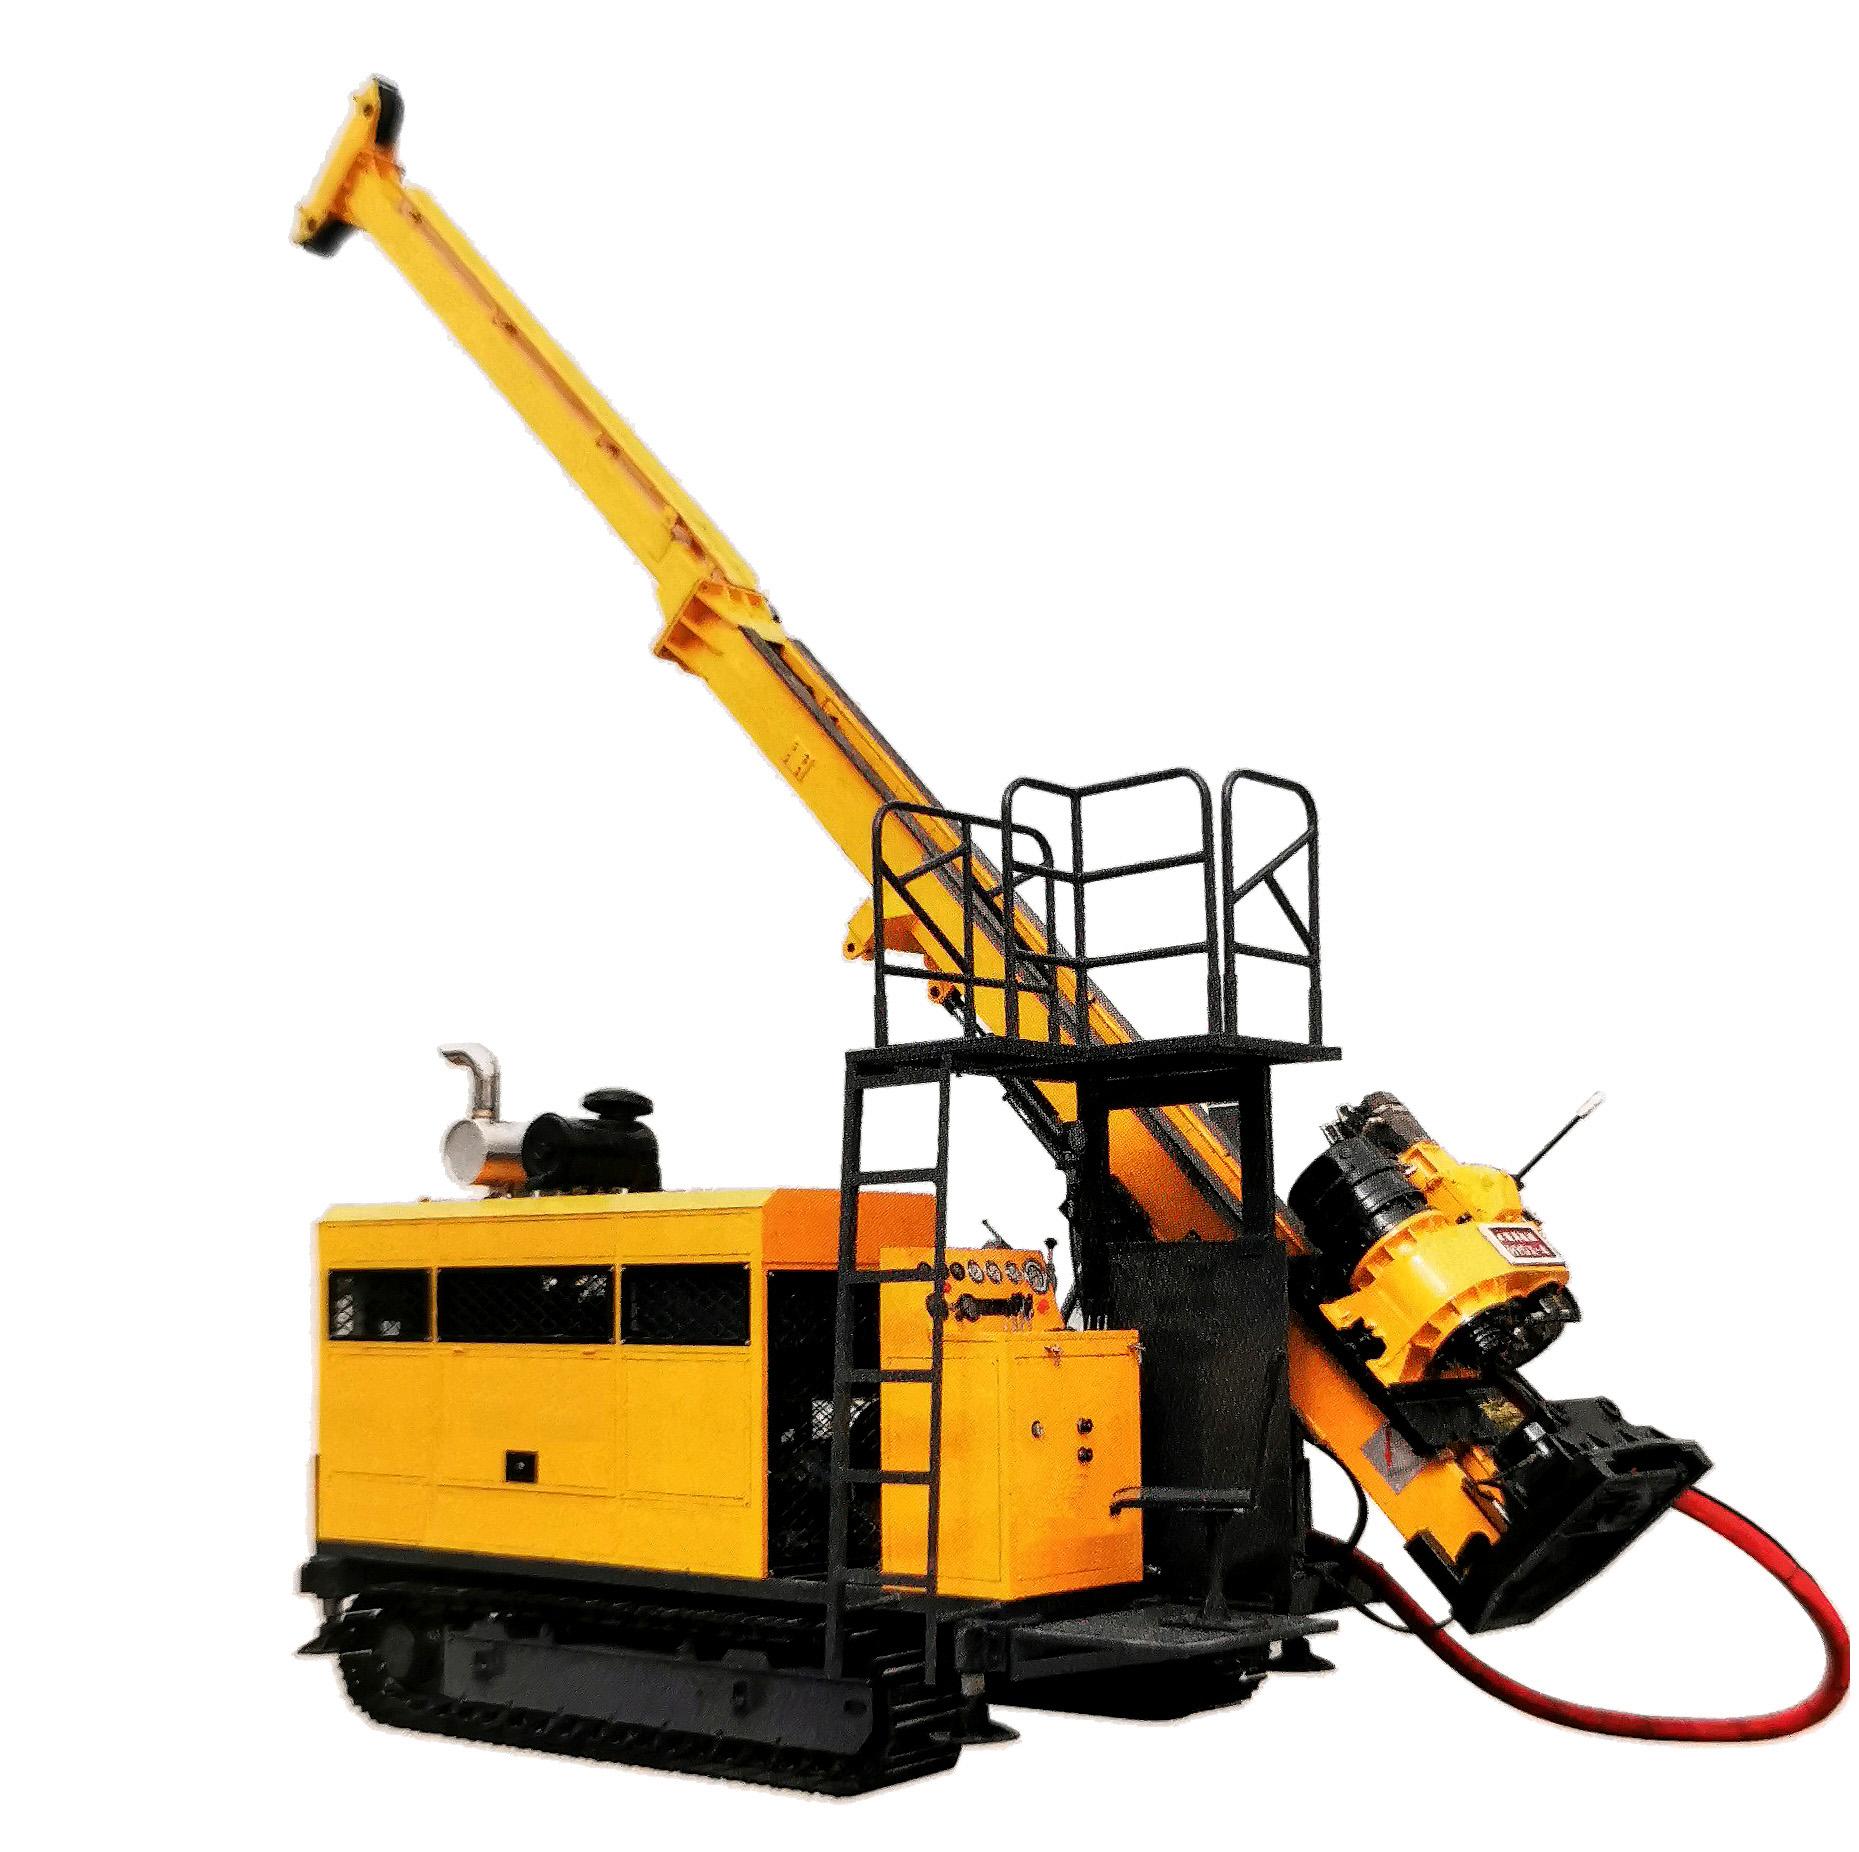 Full Hydraulic Core Drill Rig